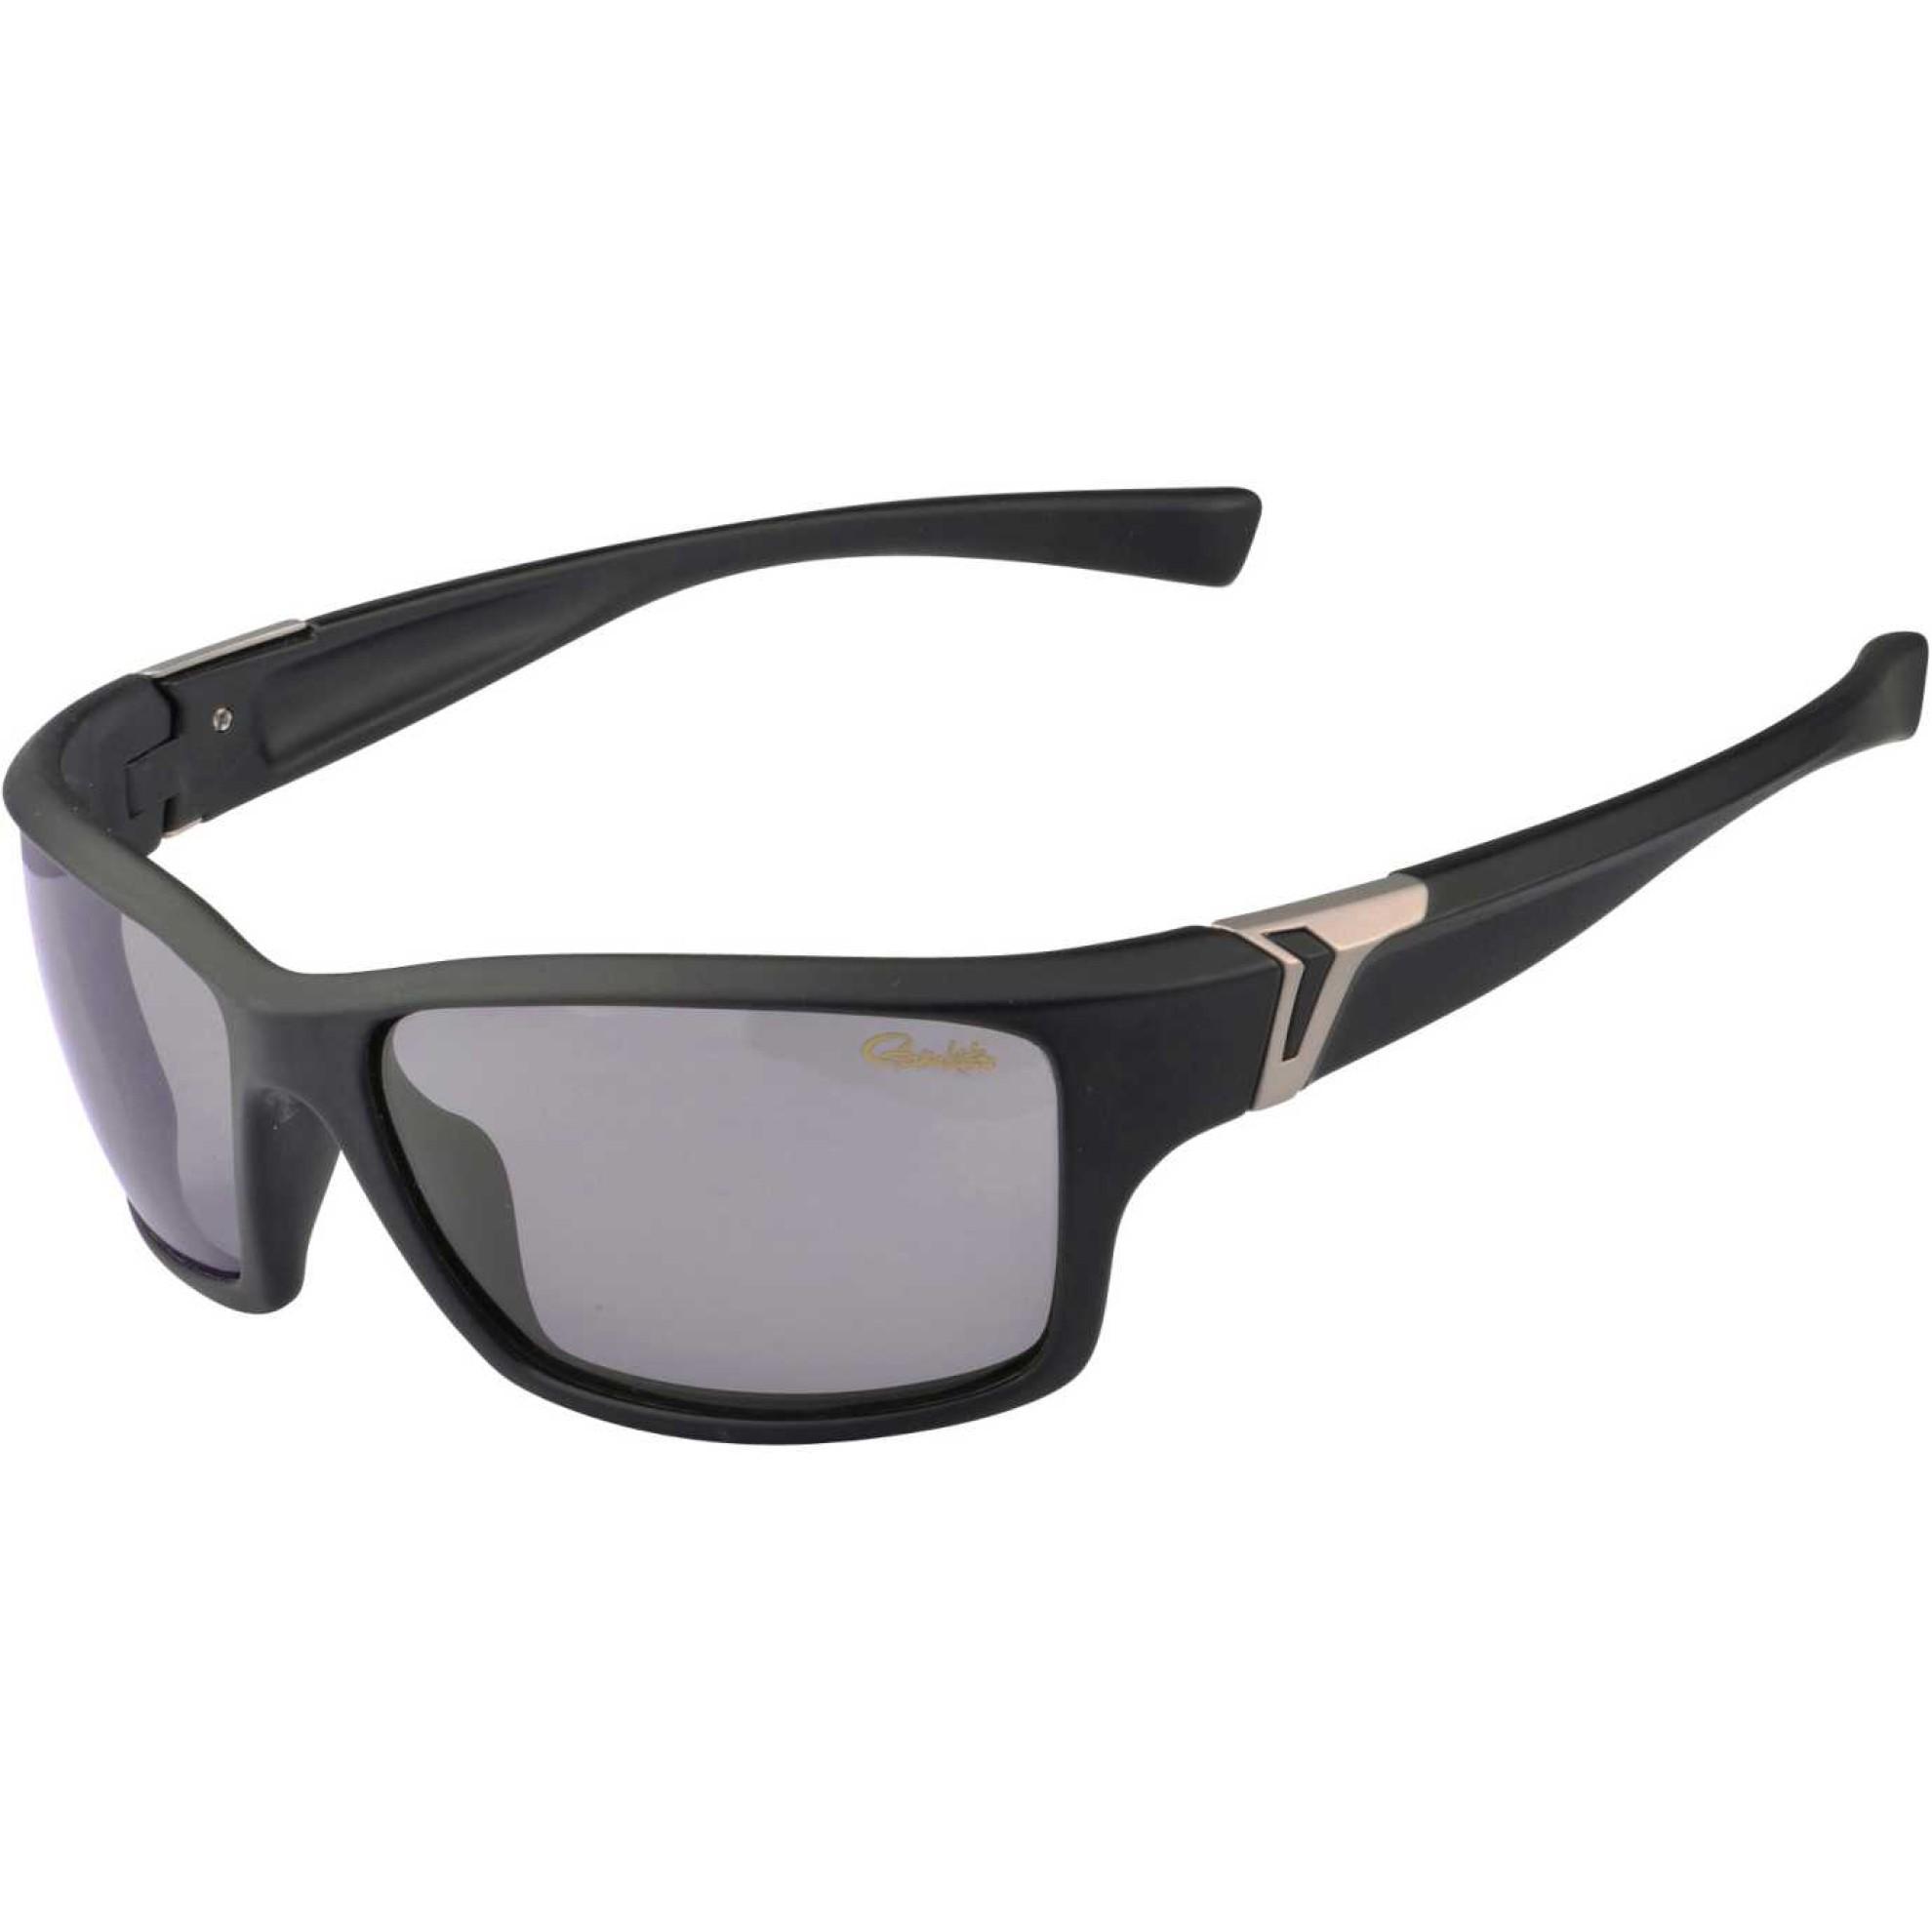 GamakatsuG-Glasses Polarisationsbrille Racer Light Gray Mirror JhxJU